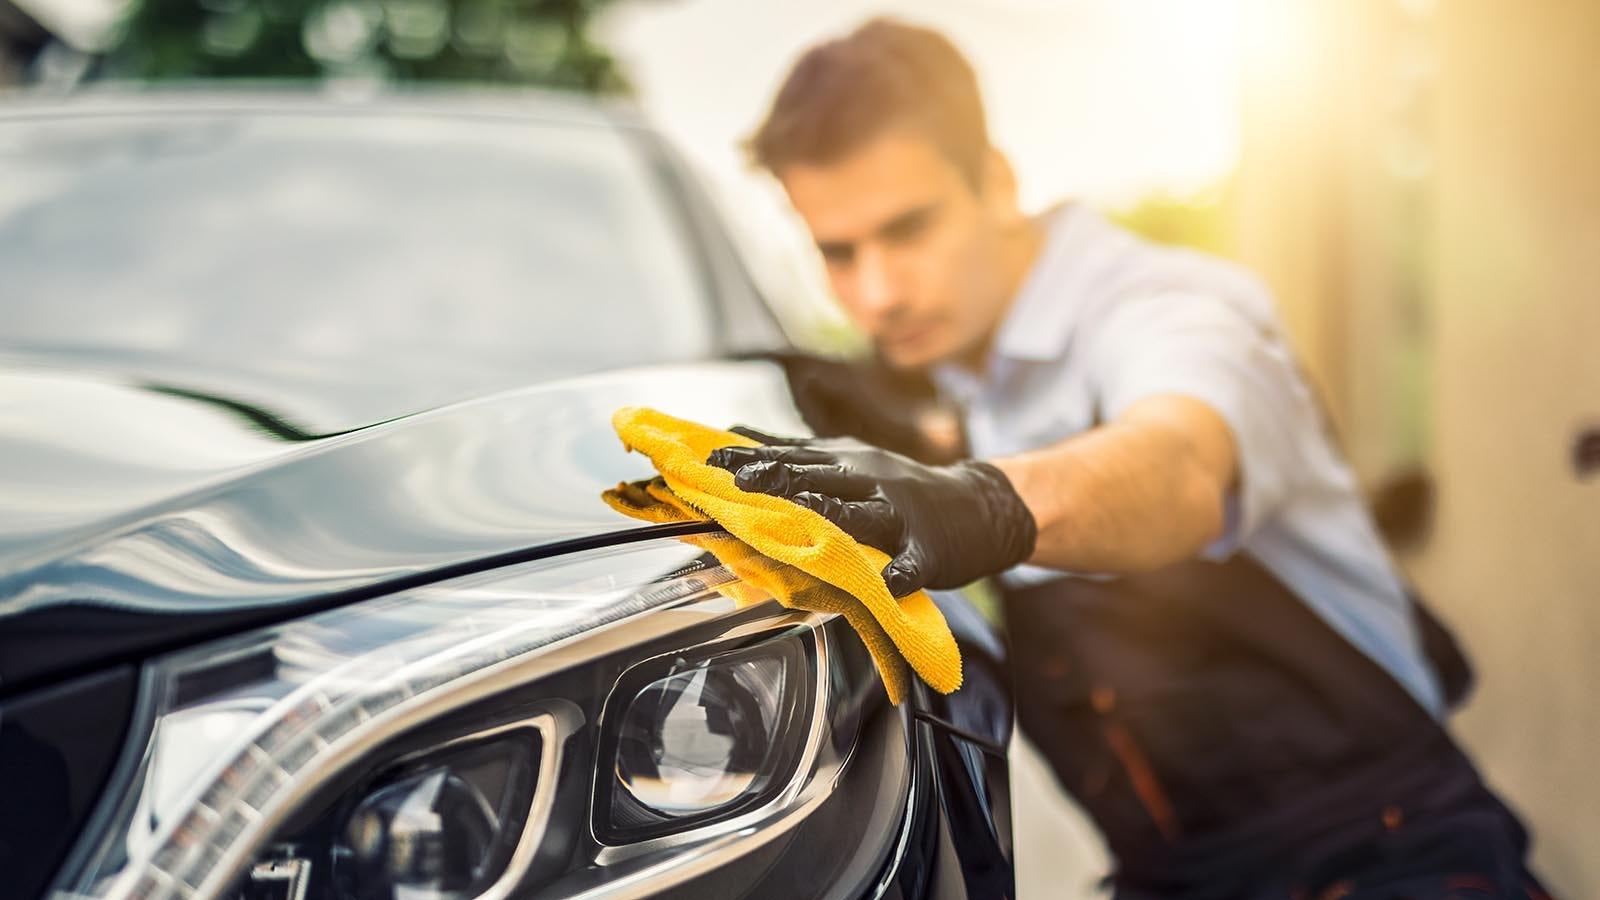 Man polishing a car with microfiber cloth